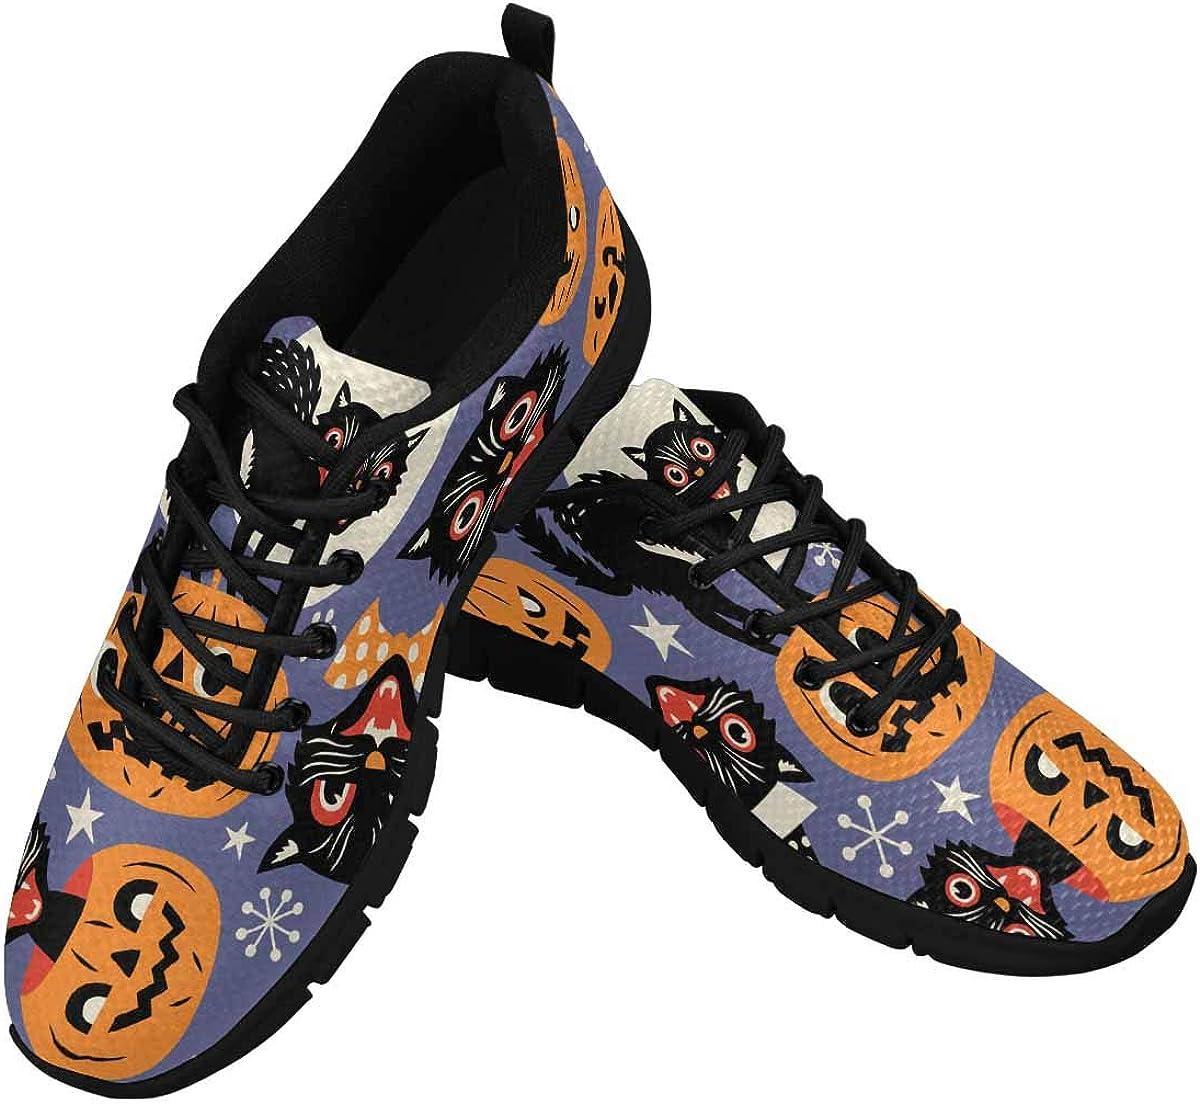 INTERESTPRINT Halloween Pumpkin Cats Women's Running Shoes Mesh Breathable Sports Casual Shoes